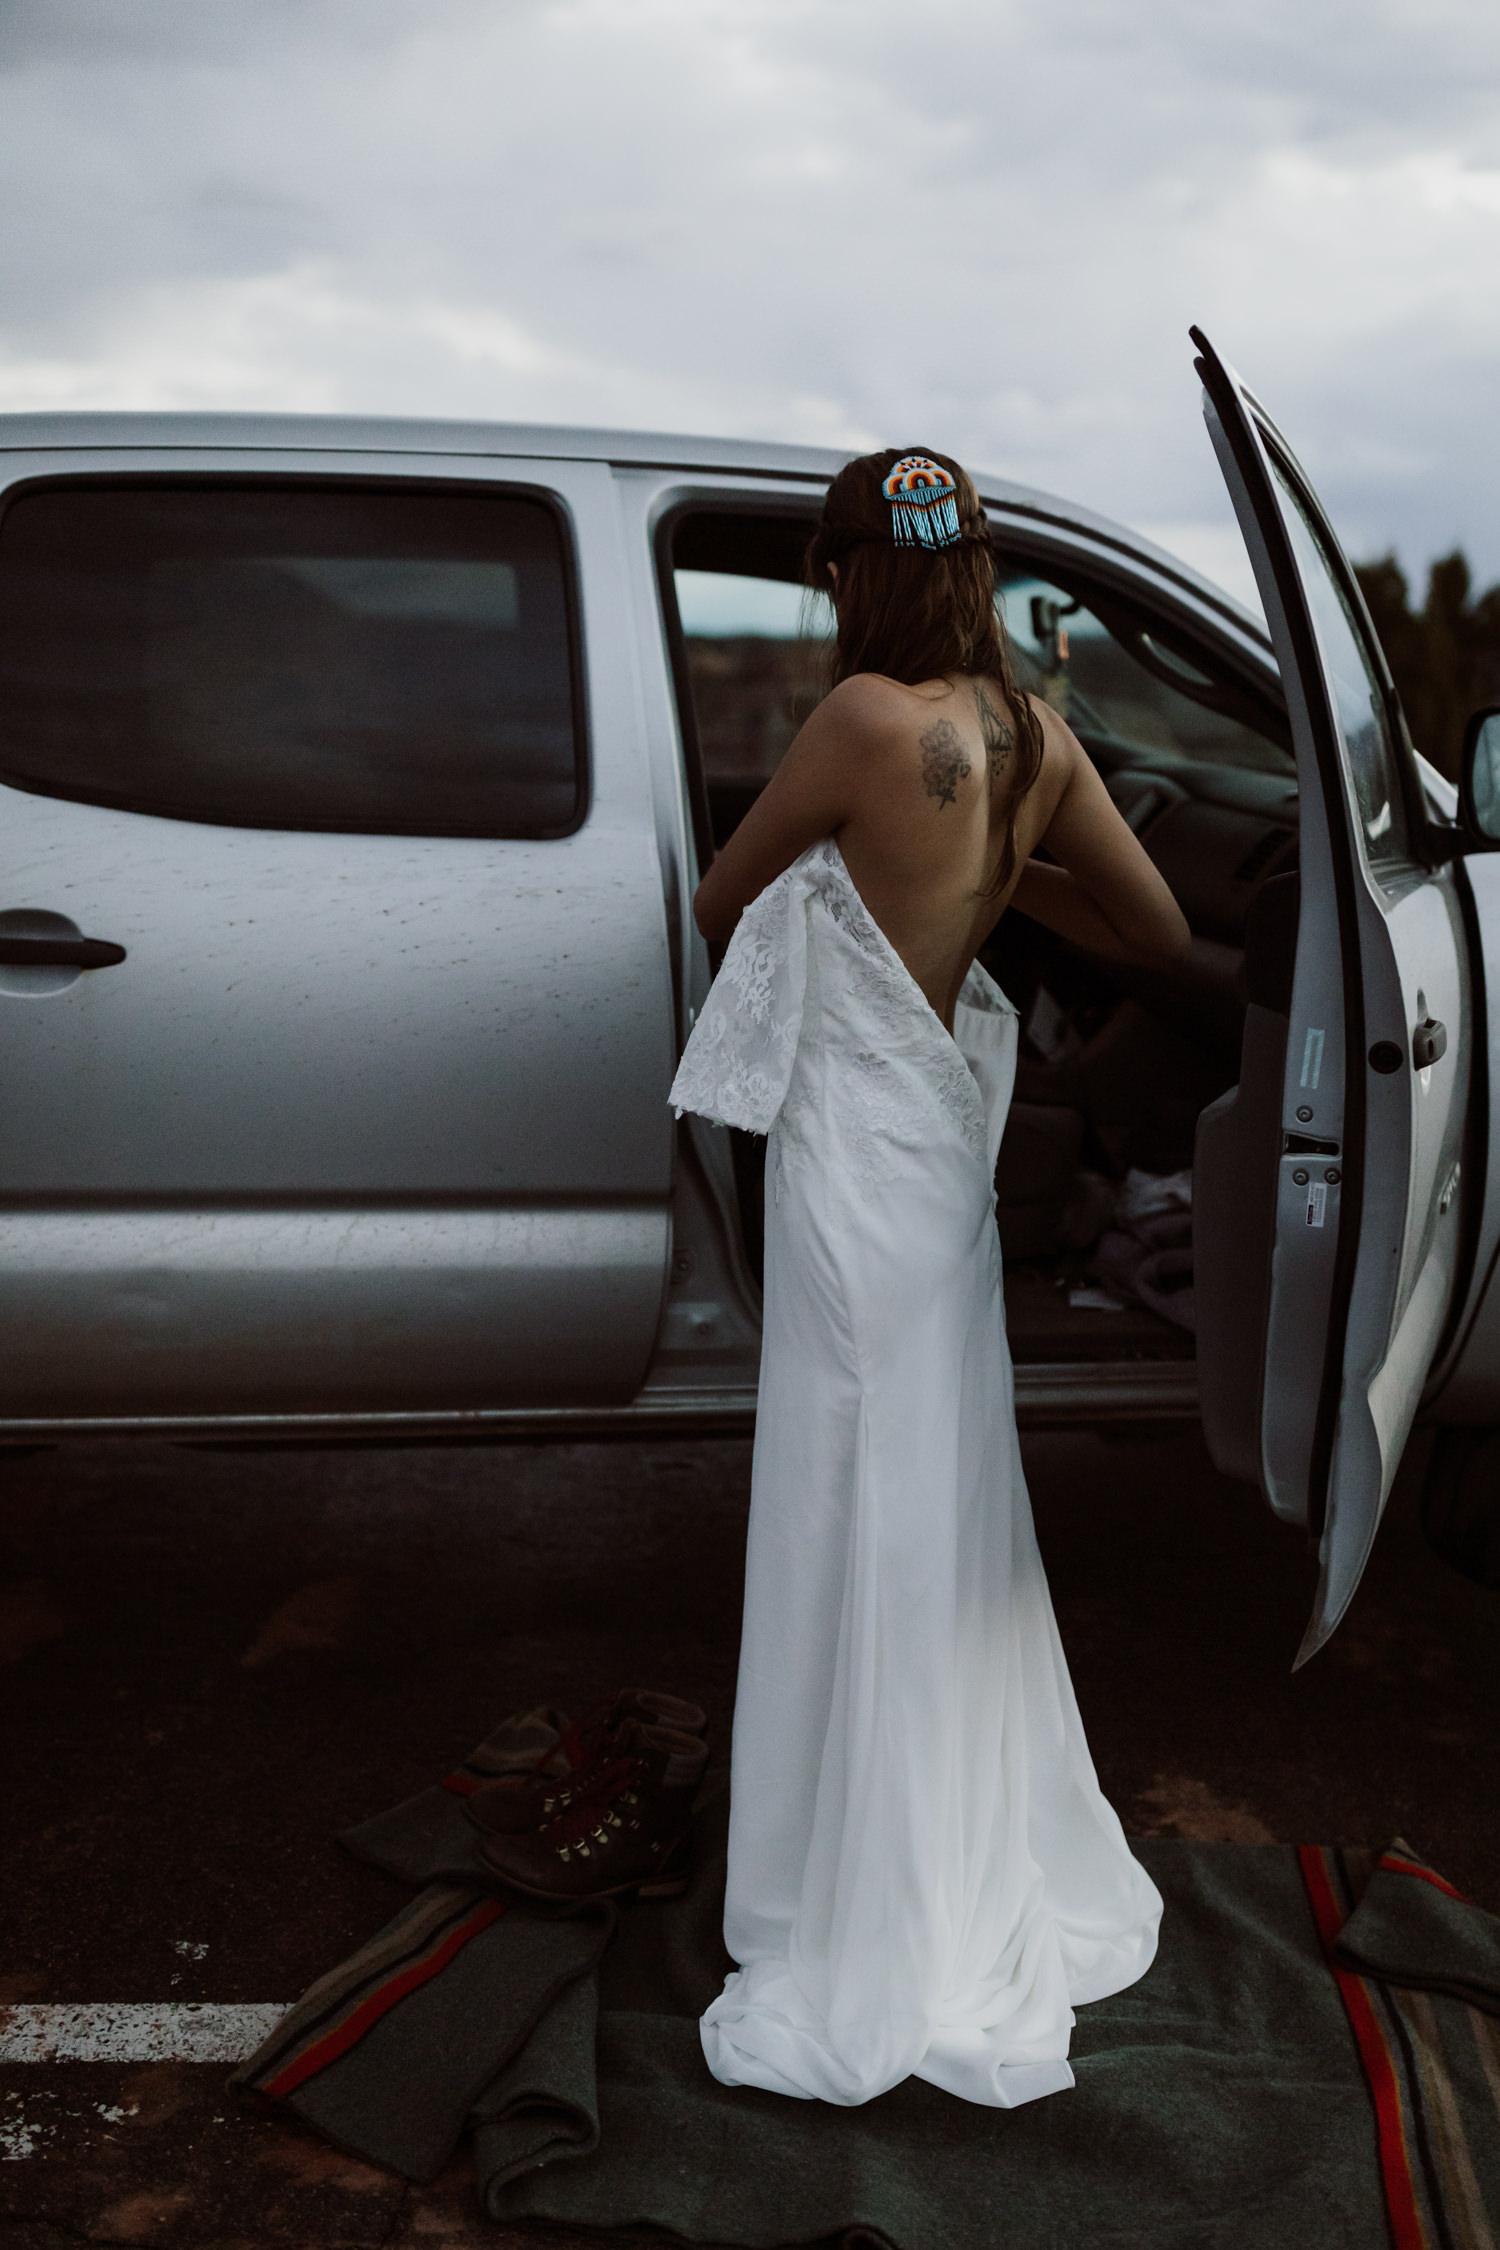 02_bride_adventure_getting_ready.jpg